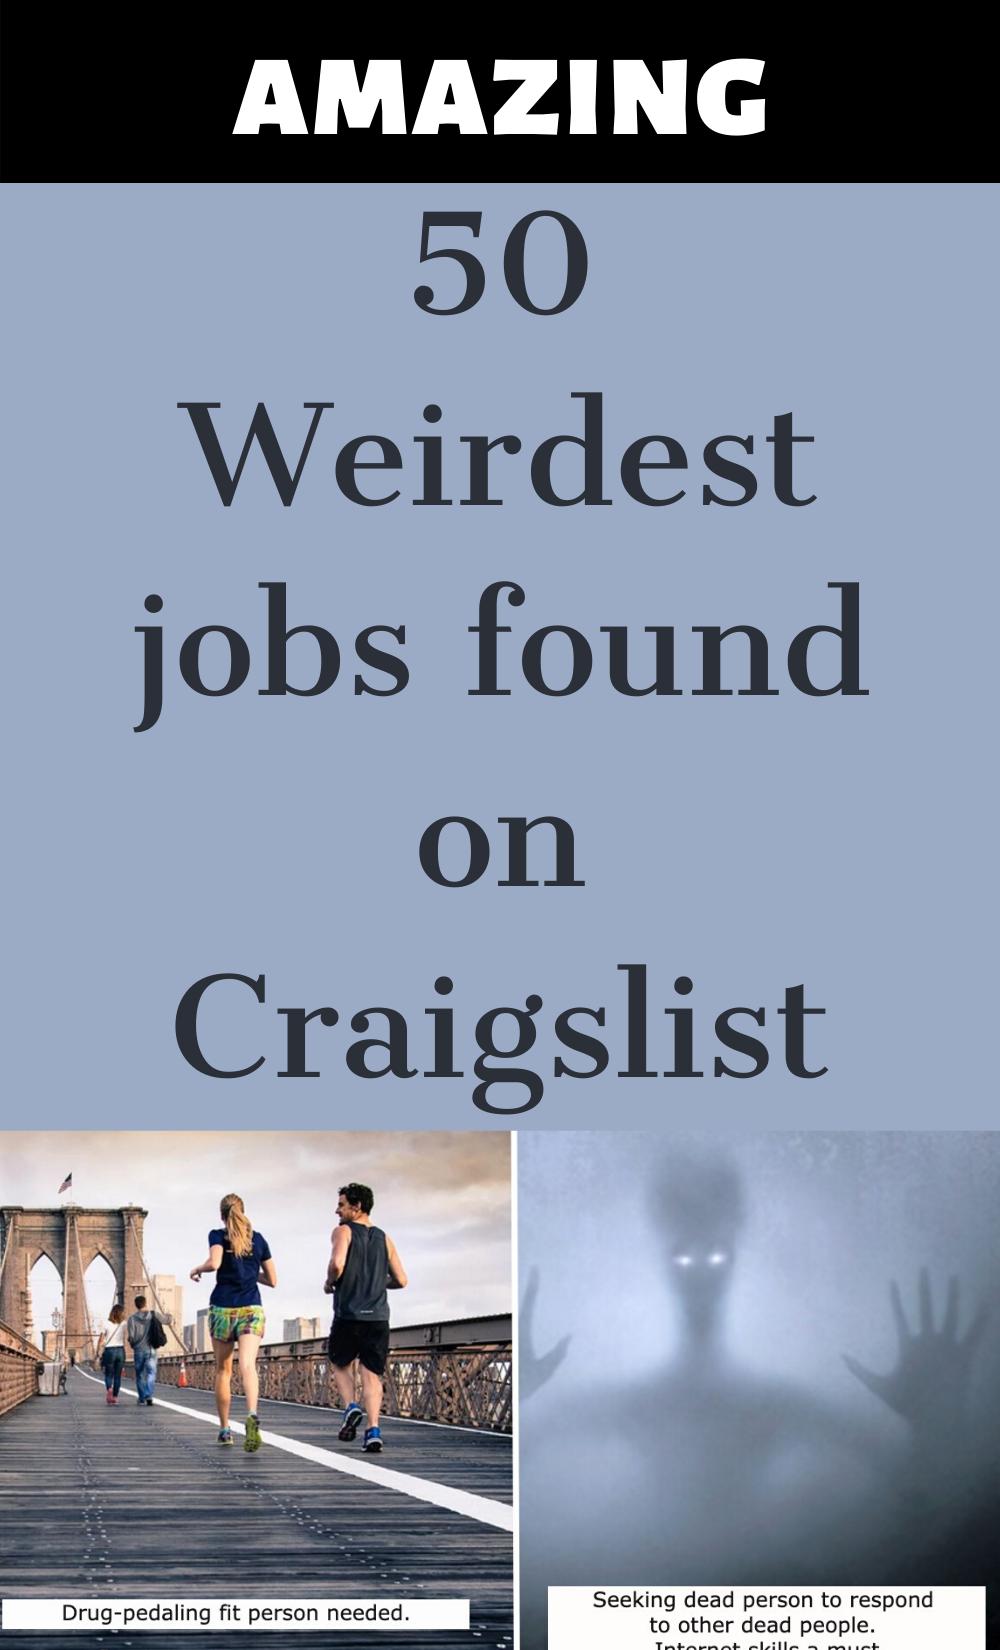 50 Of The Weirdest Job Ads Found On Craigslist In 2020 Find A Job Job Ads Job